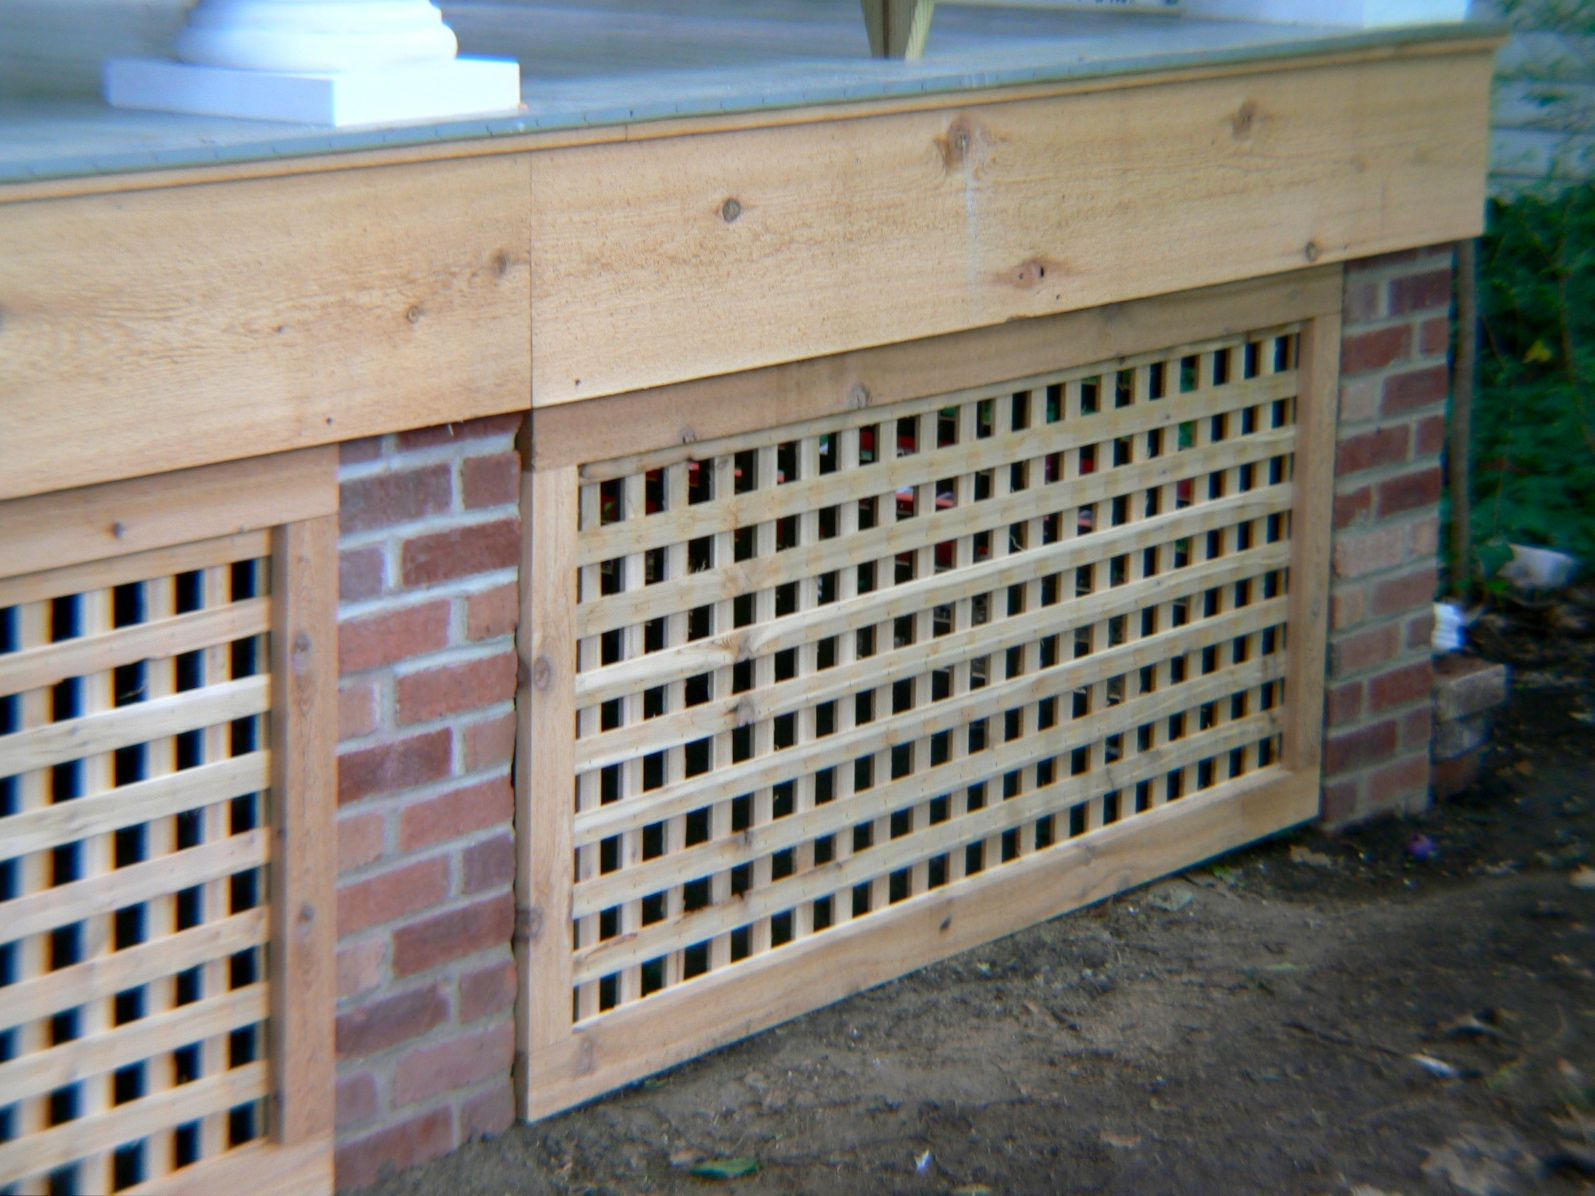 Pin By Jennifer Mckinney On Back Deck Front Porch Ideas Porch Lattice Porch Remodel Building A Porch